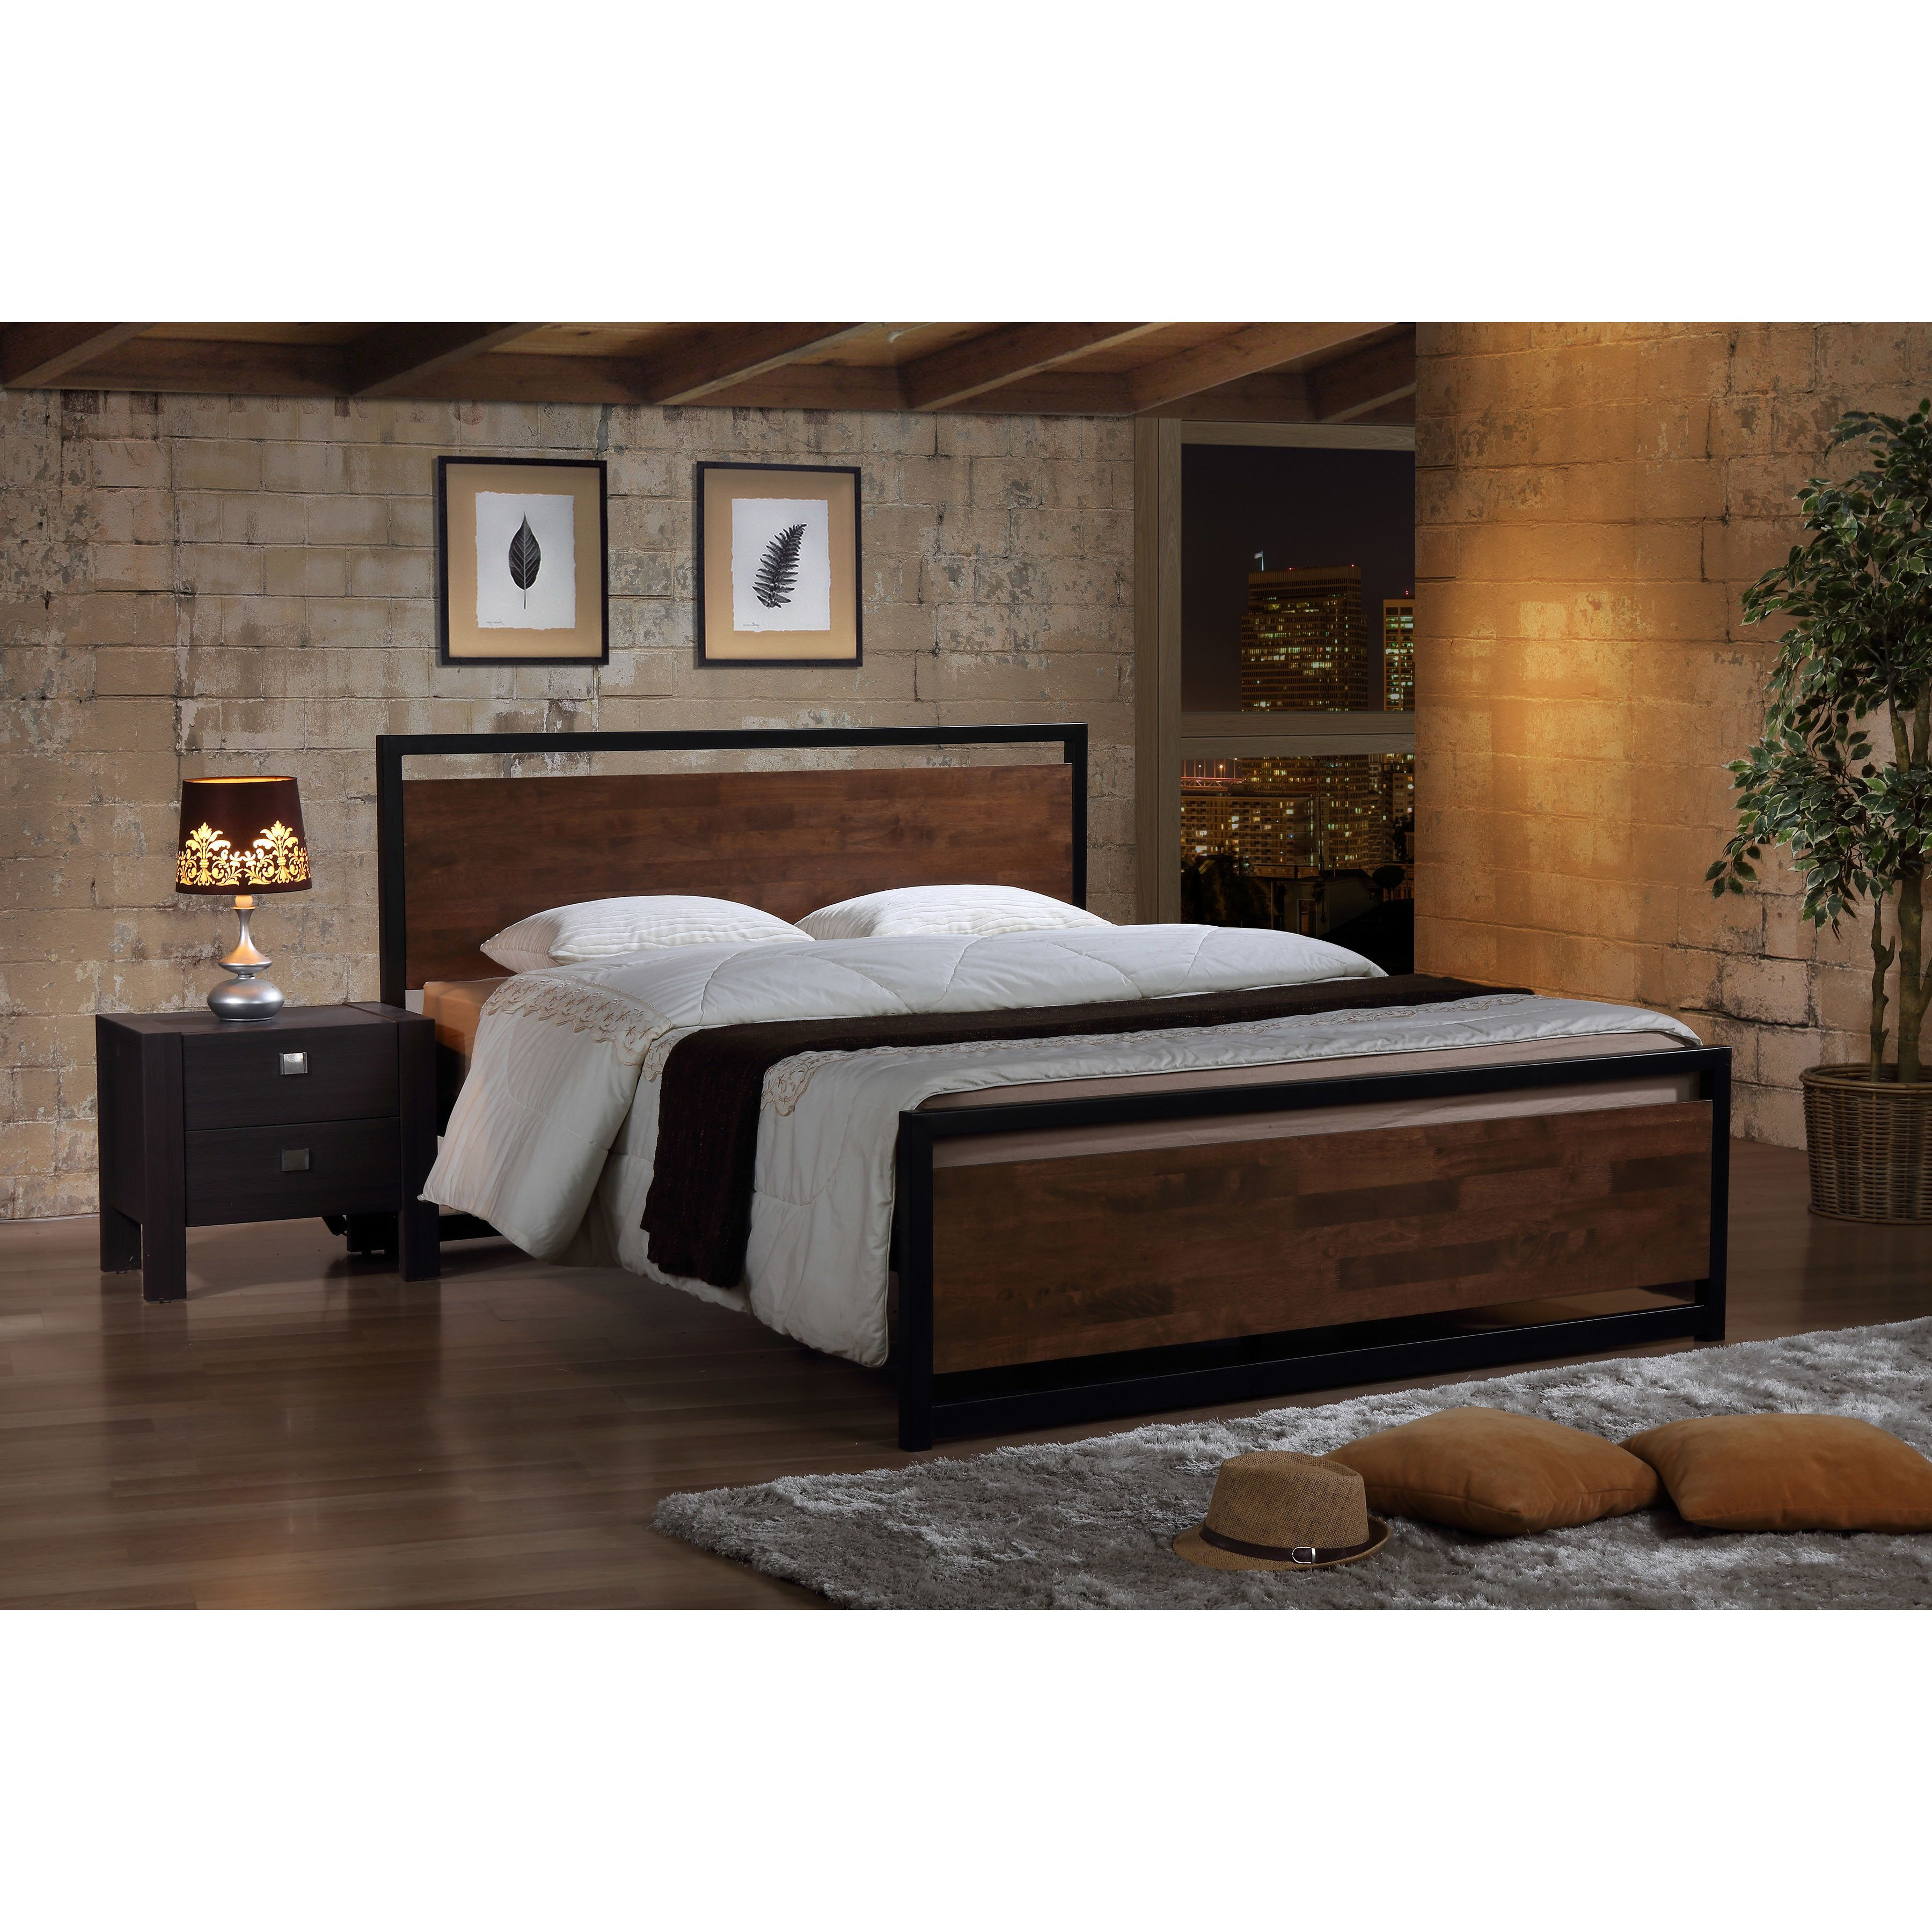 Baxston Studio Gabby Platform Bed